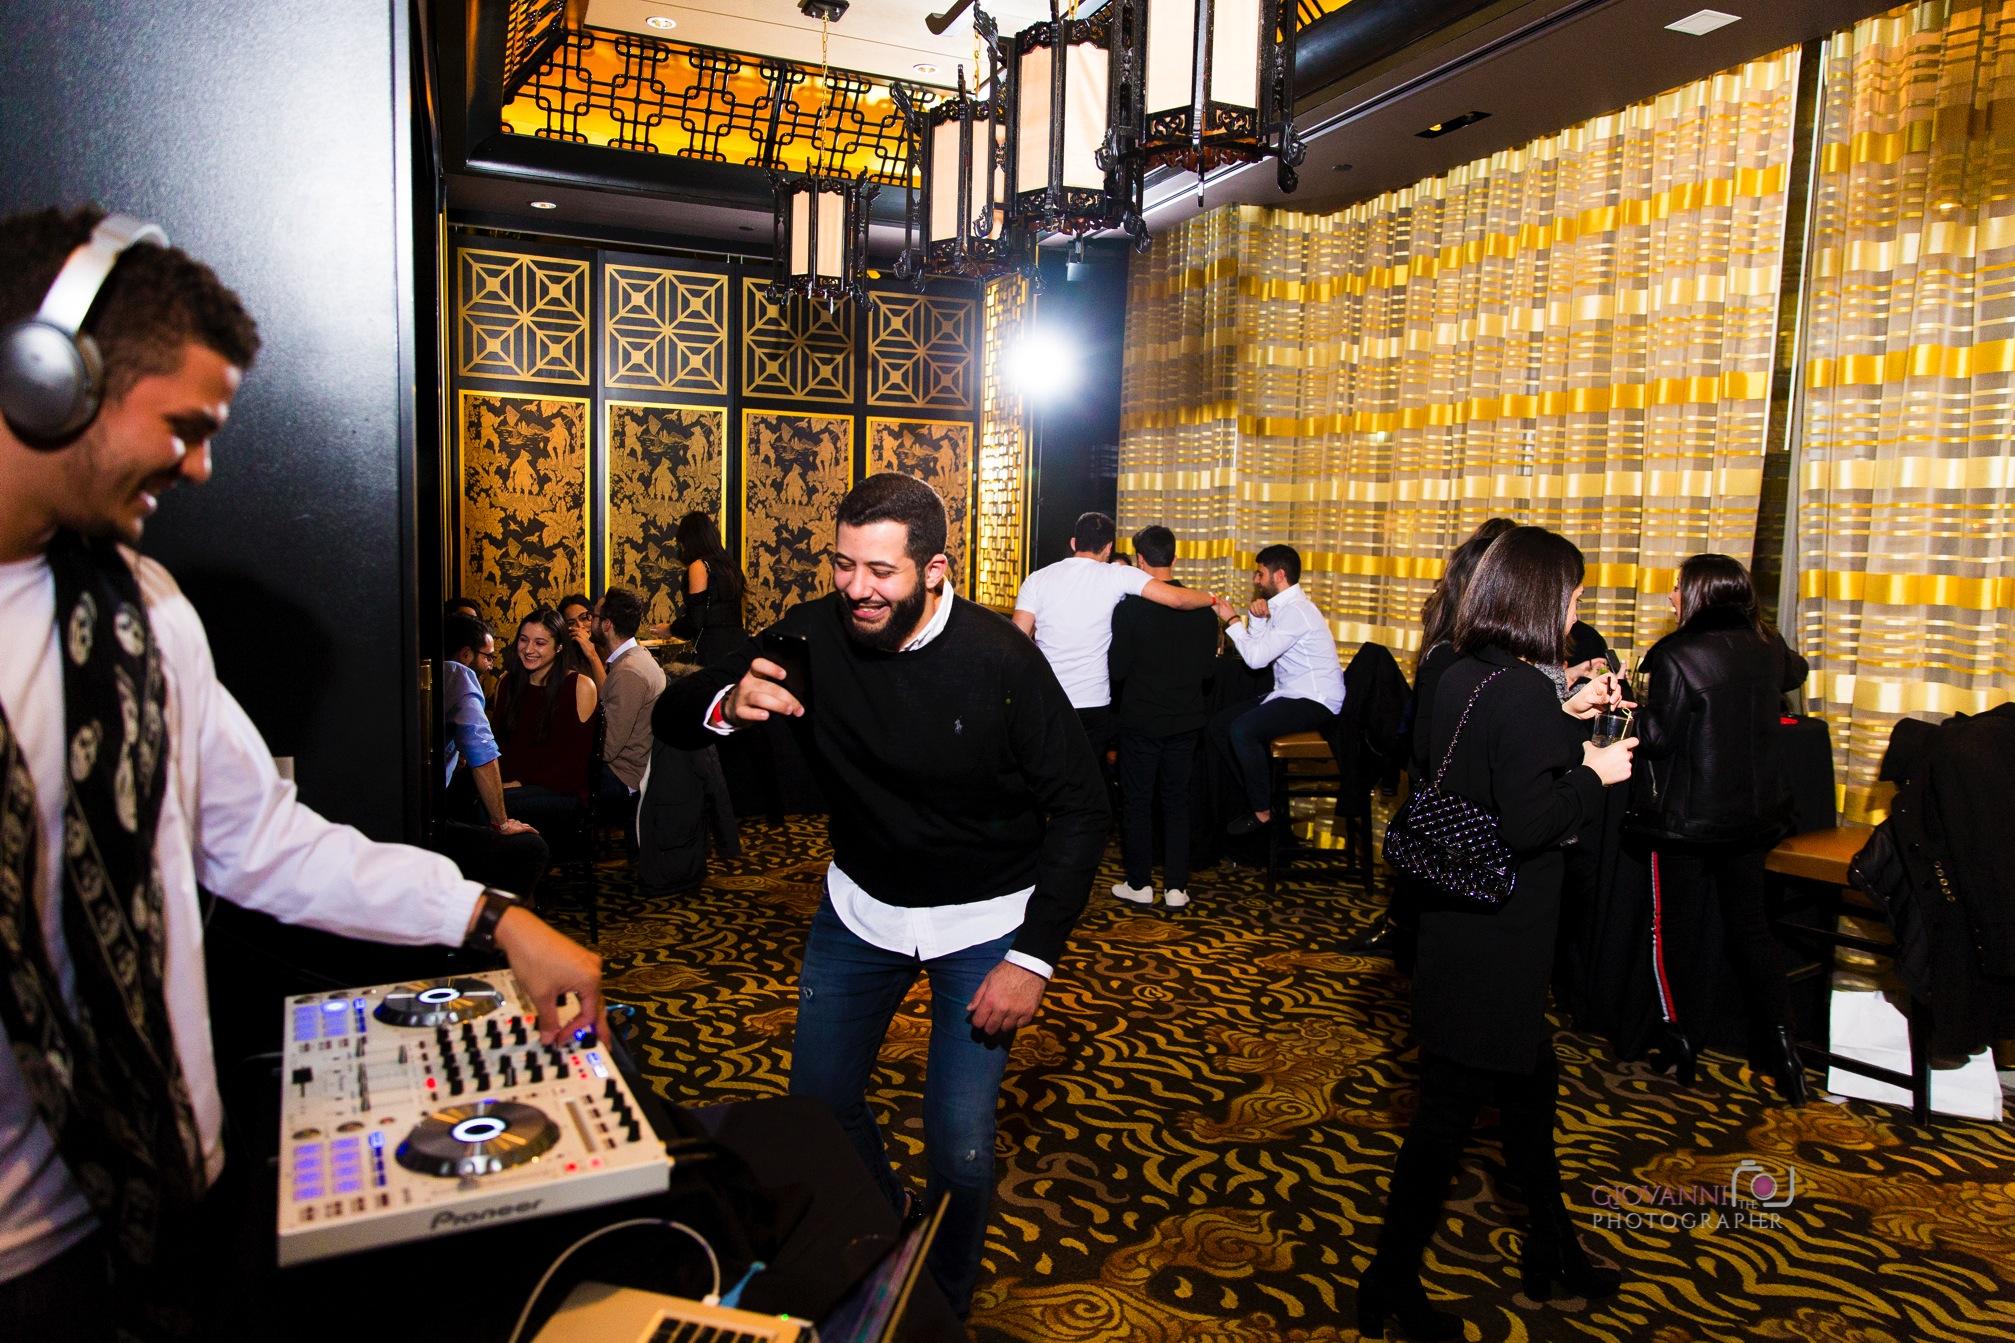 8C2A0292 Giovanni The Photographer Boston Event Photographer Mohamed's Birthday Photos 01-19-18 WM 35 Empire Restaurant.jpg